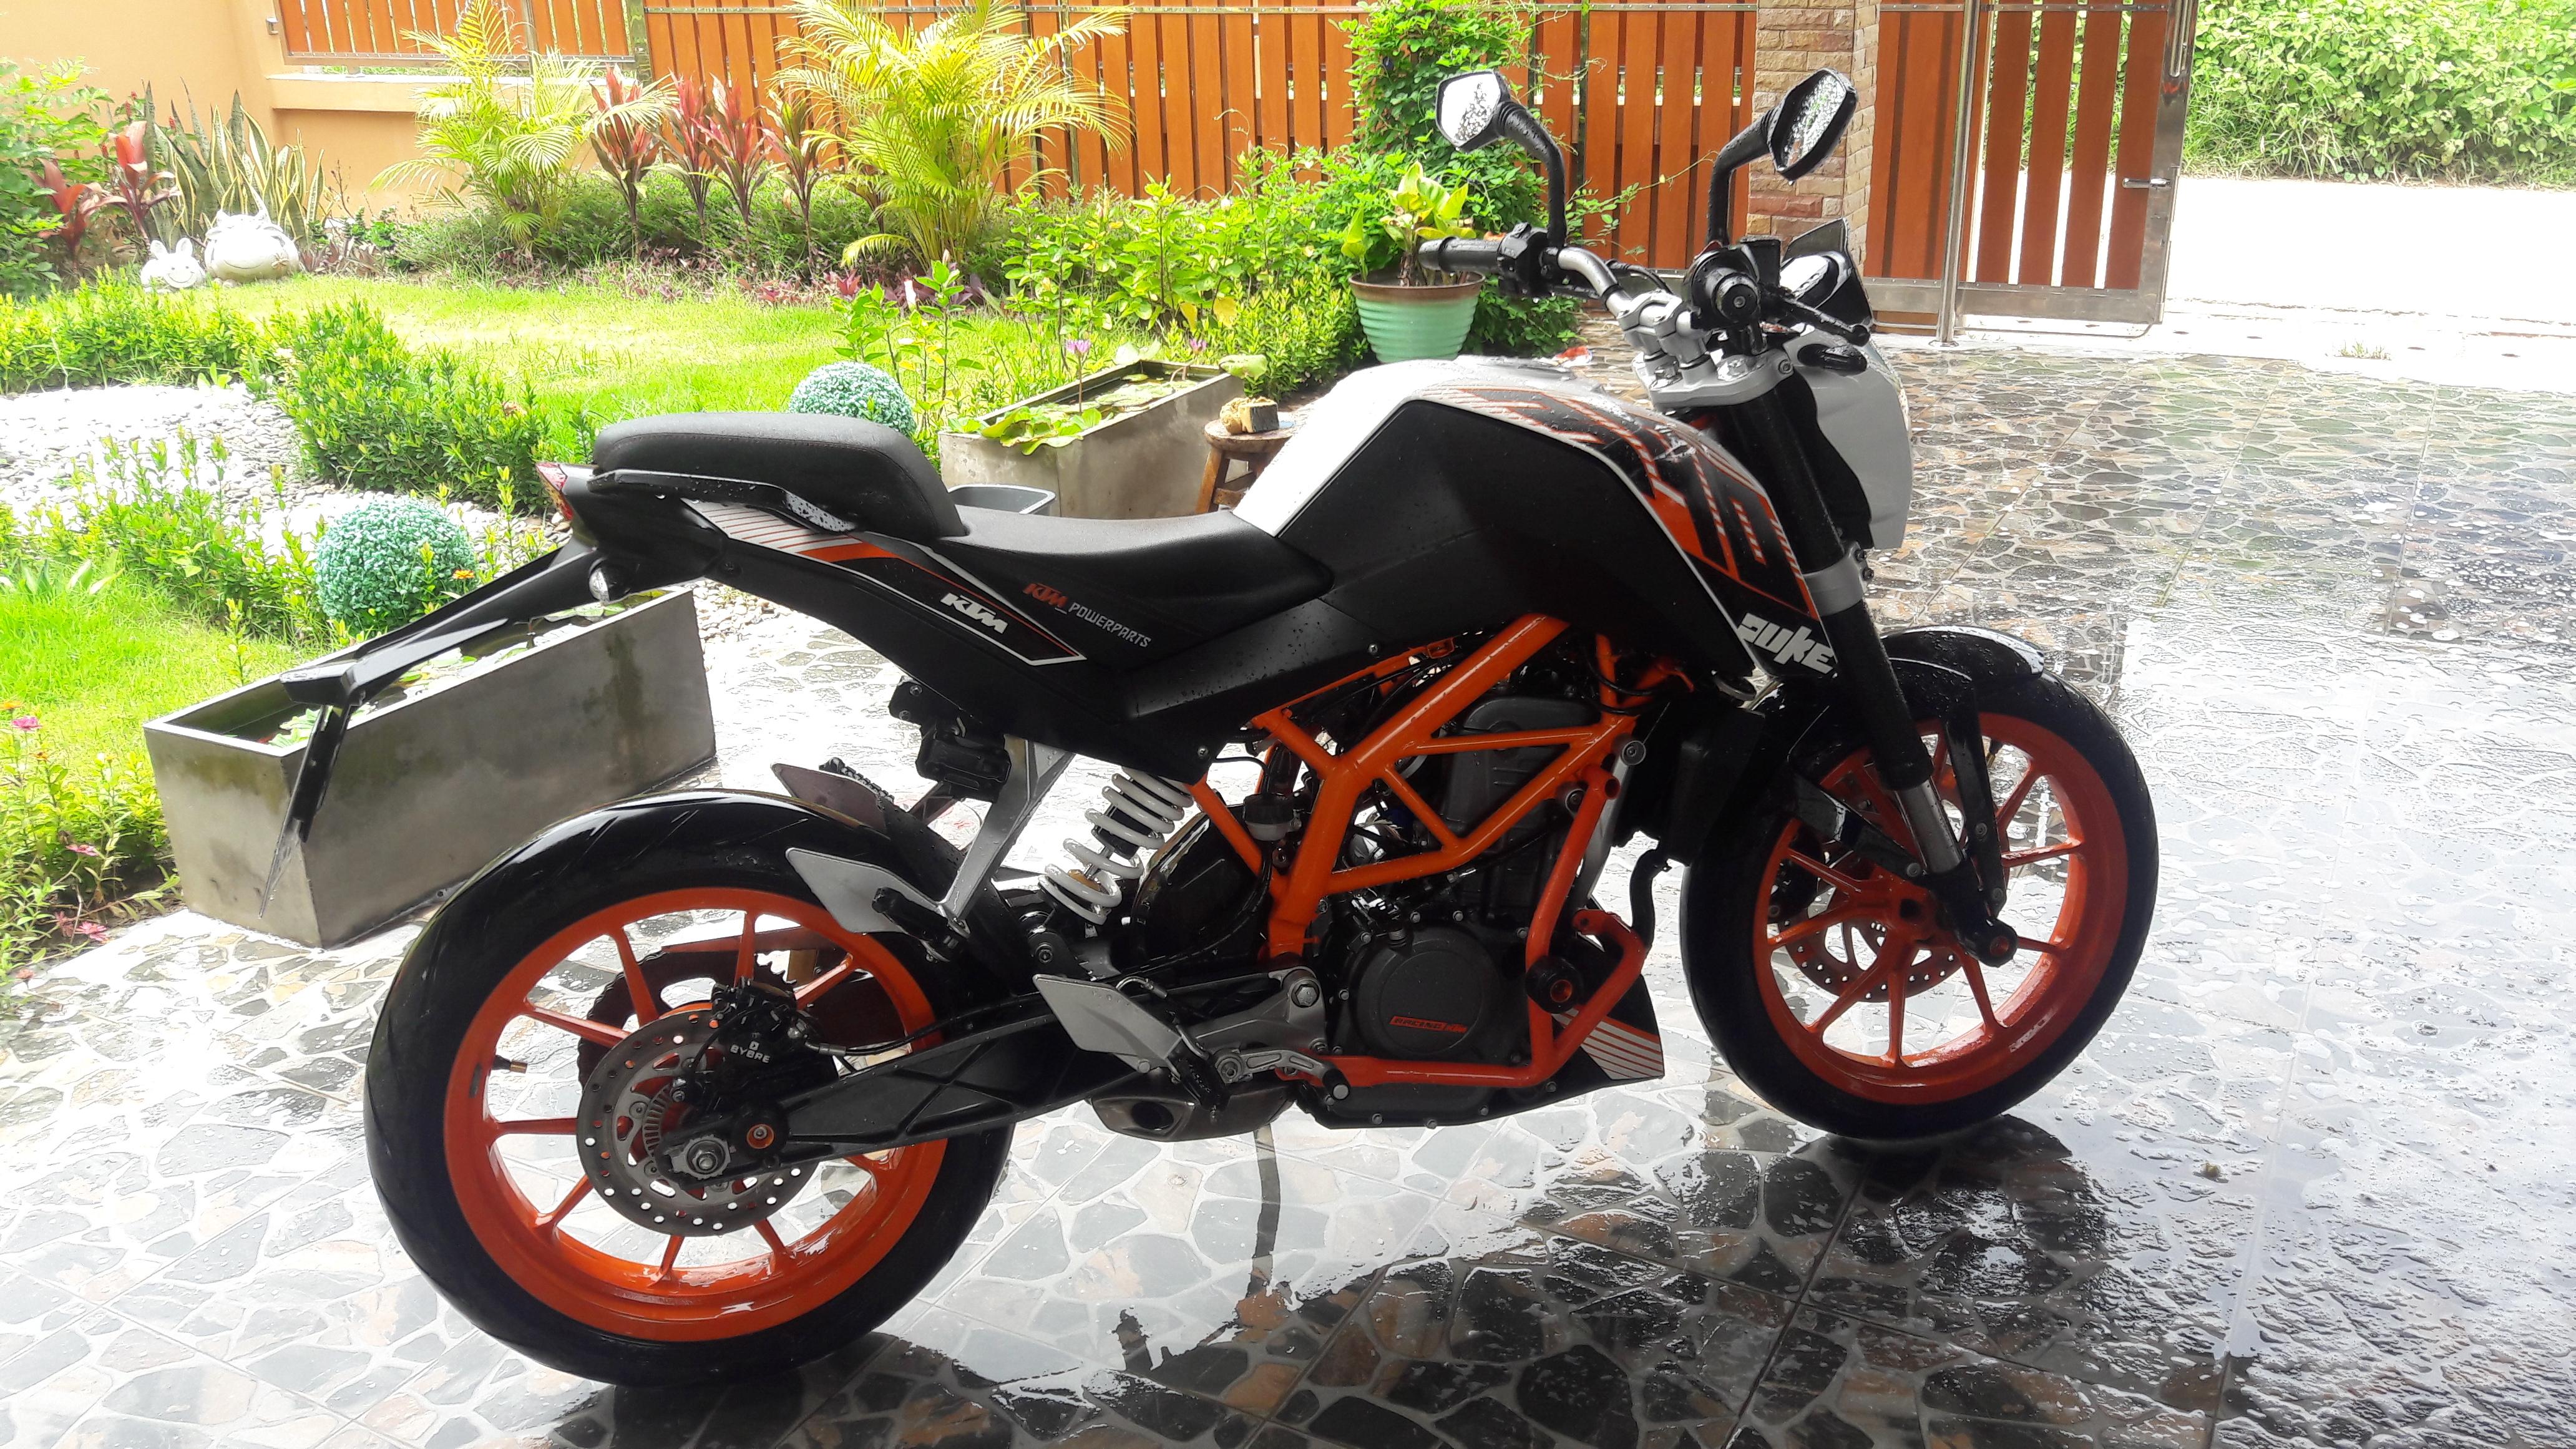 2014 ktm duke 390 for sale bikes for sale in thailand thailand visa forum by thai visa. Black Bedroom Furniture Sets. Home Design Ideas